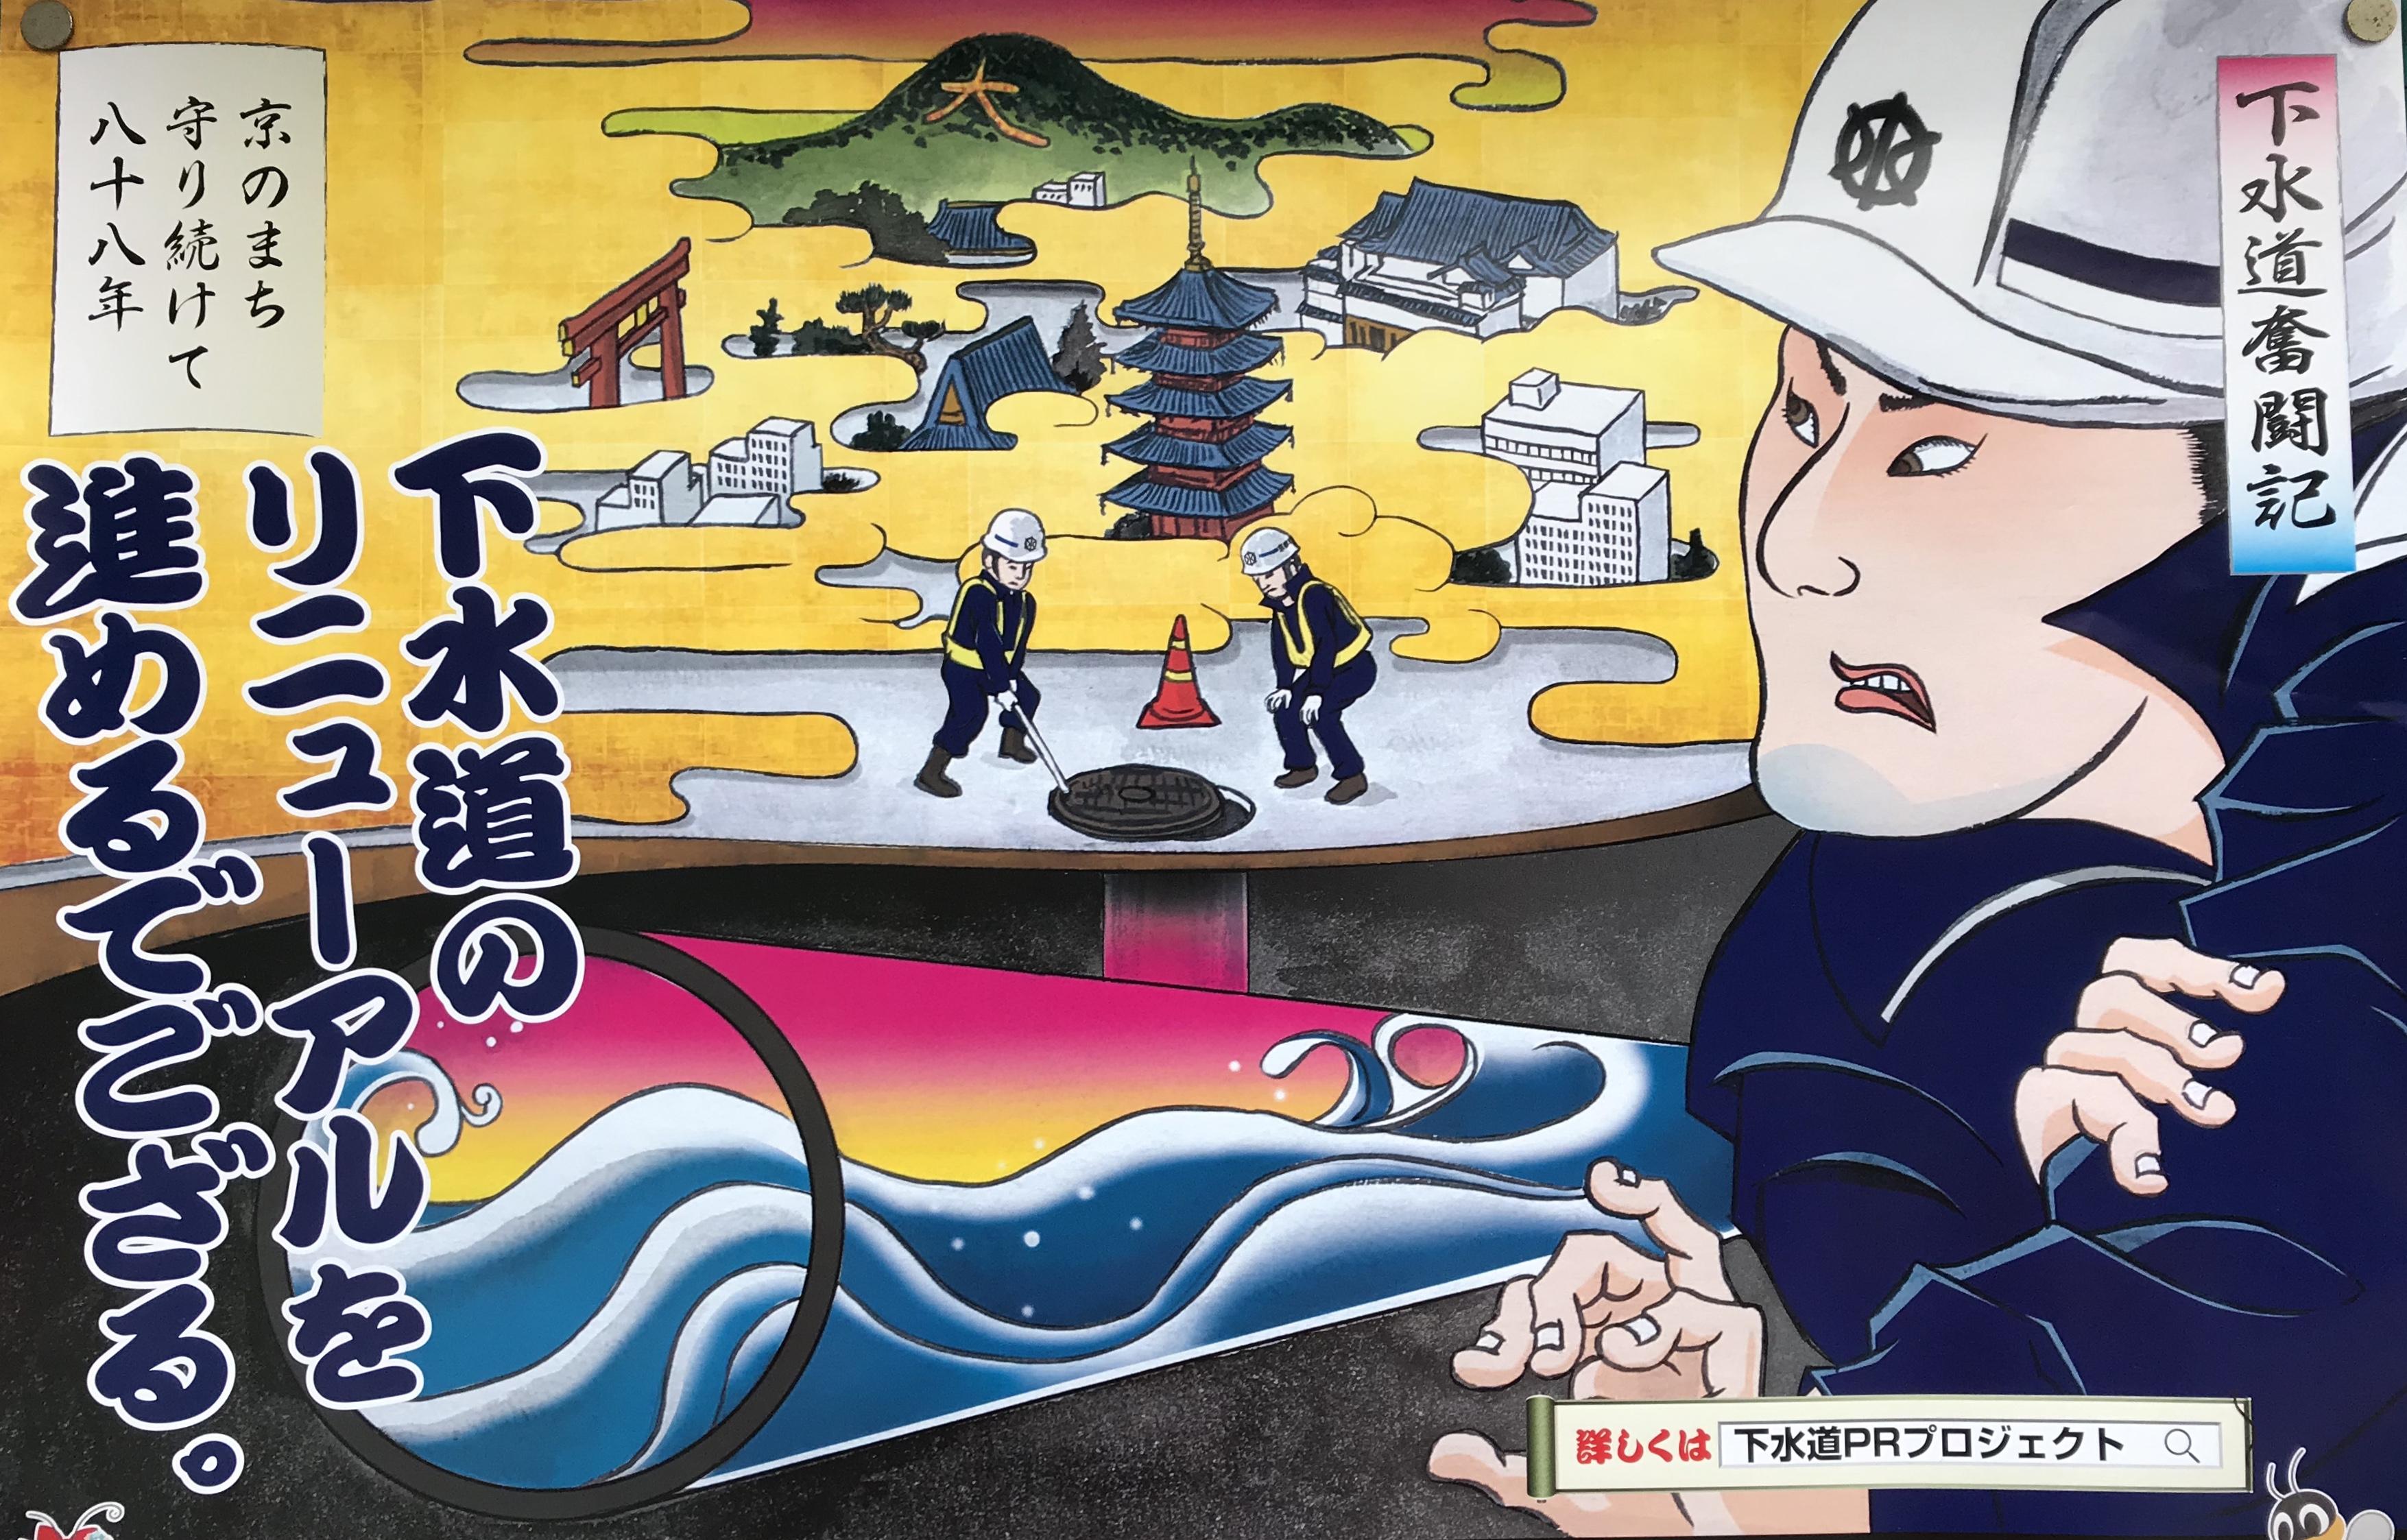 Japans Kanaldeckel-Kunst